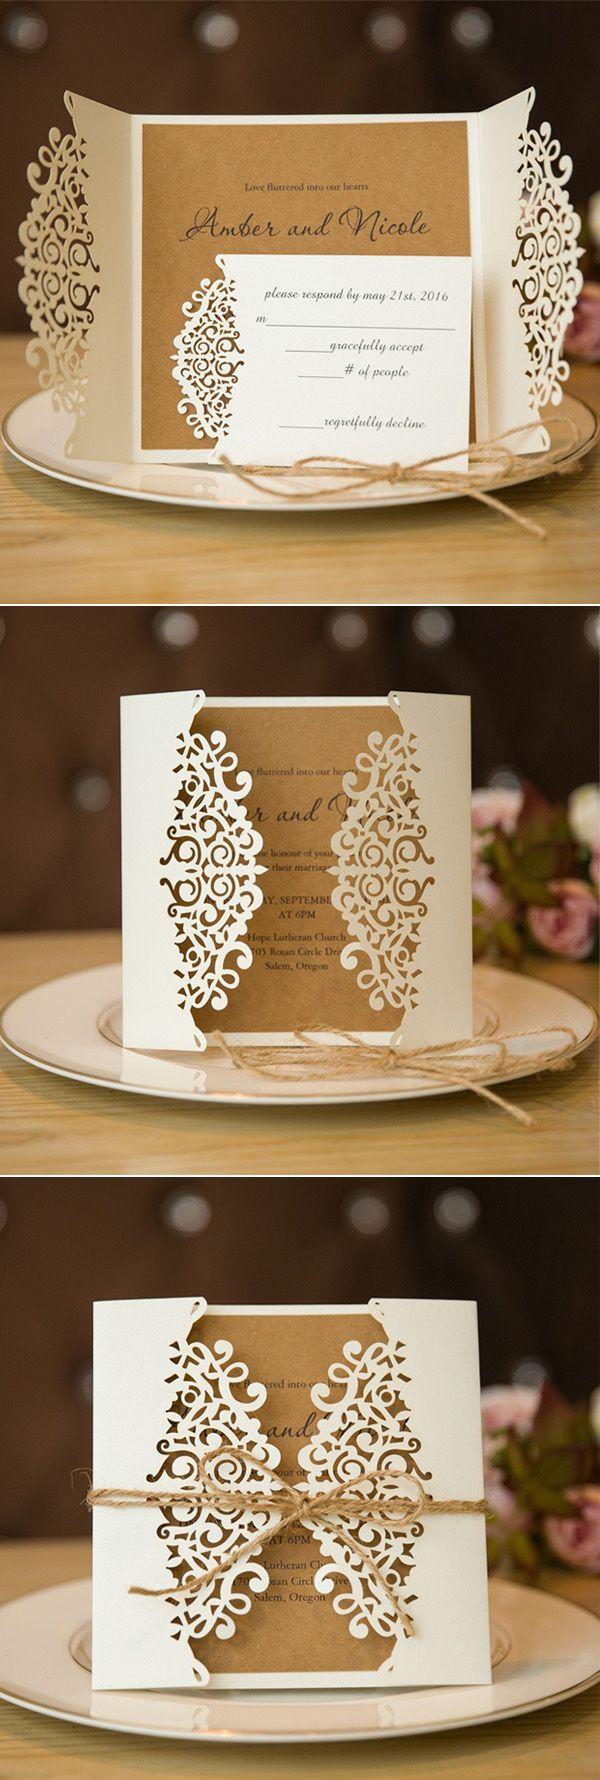 Formal White Laser Cut Wedding Invitation Cards